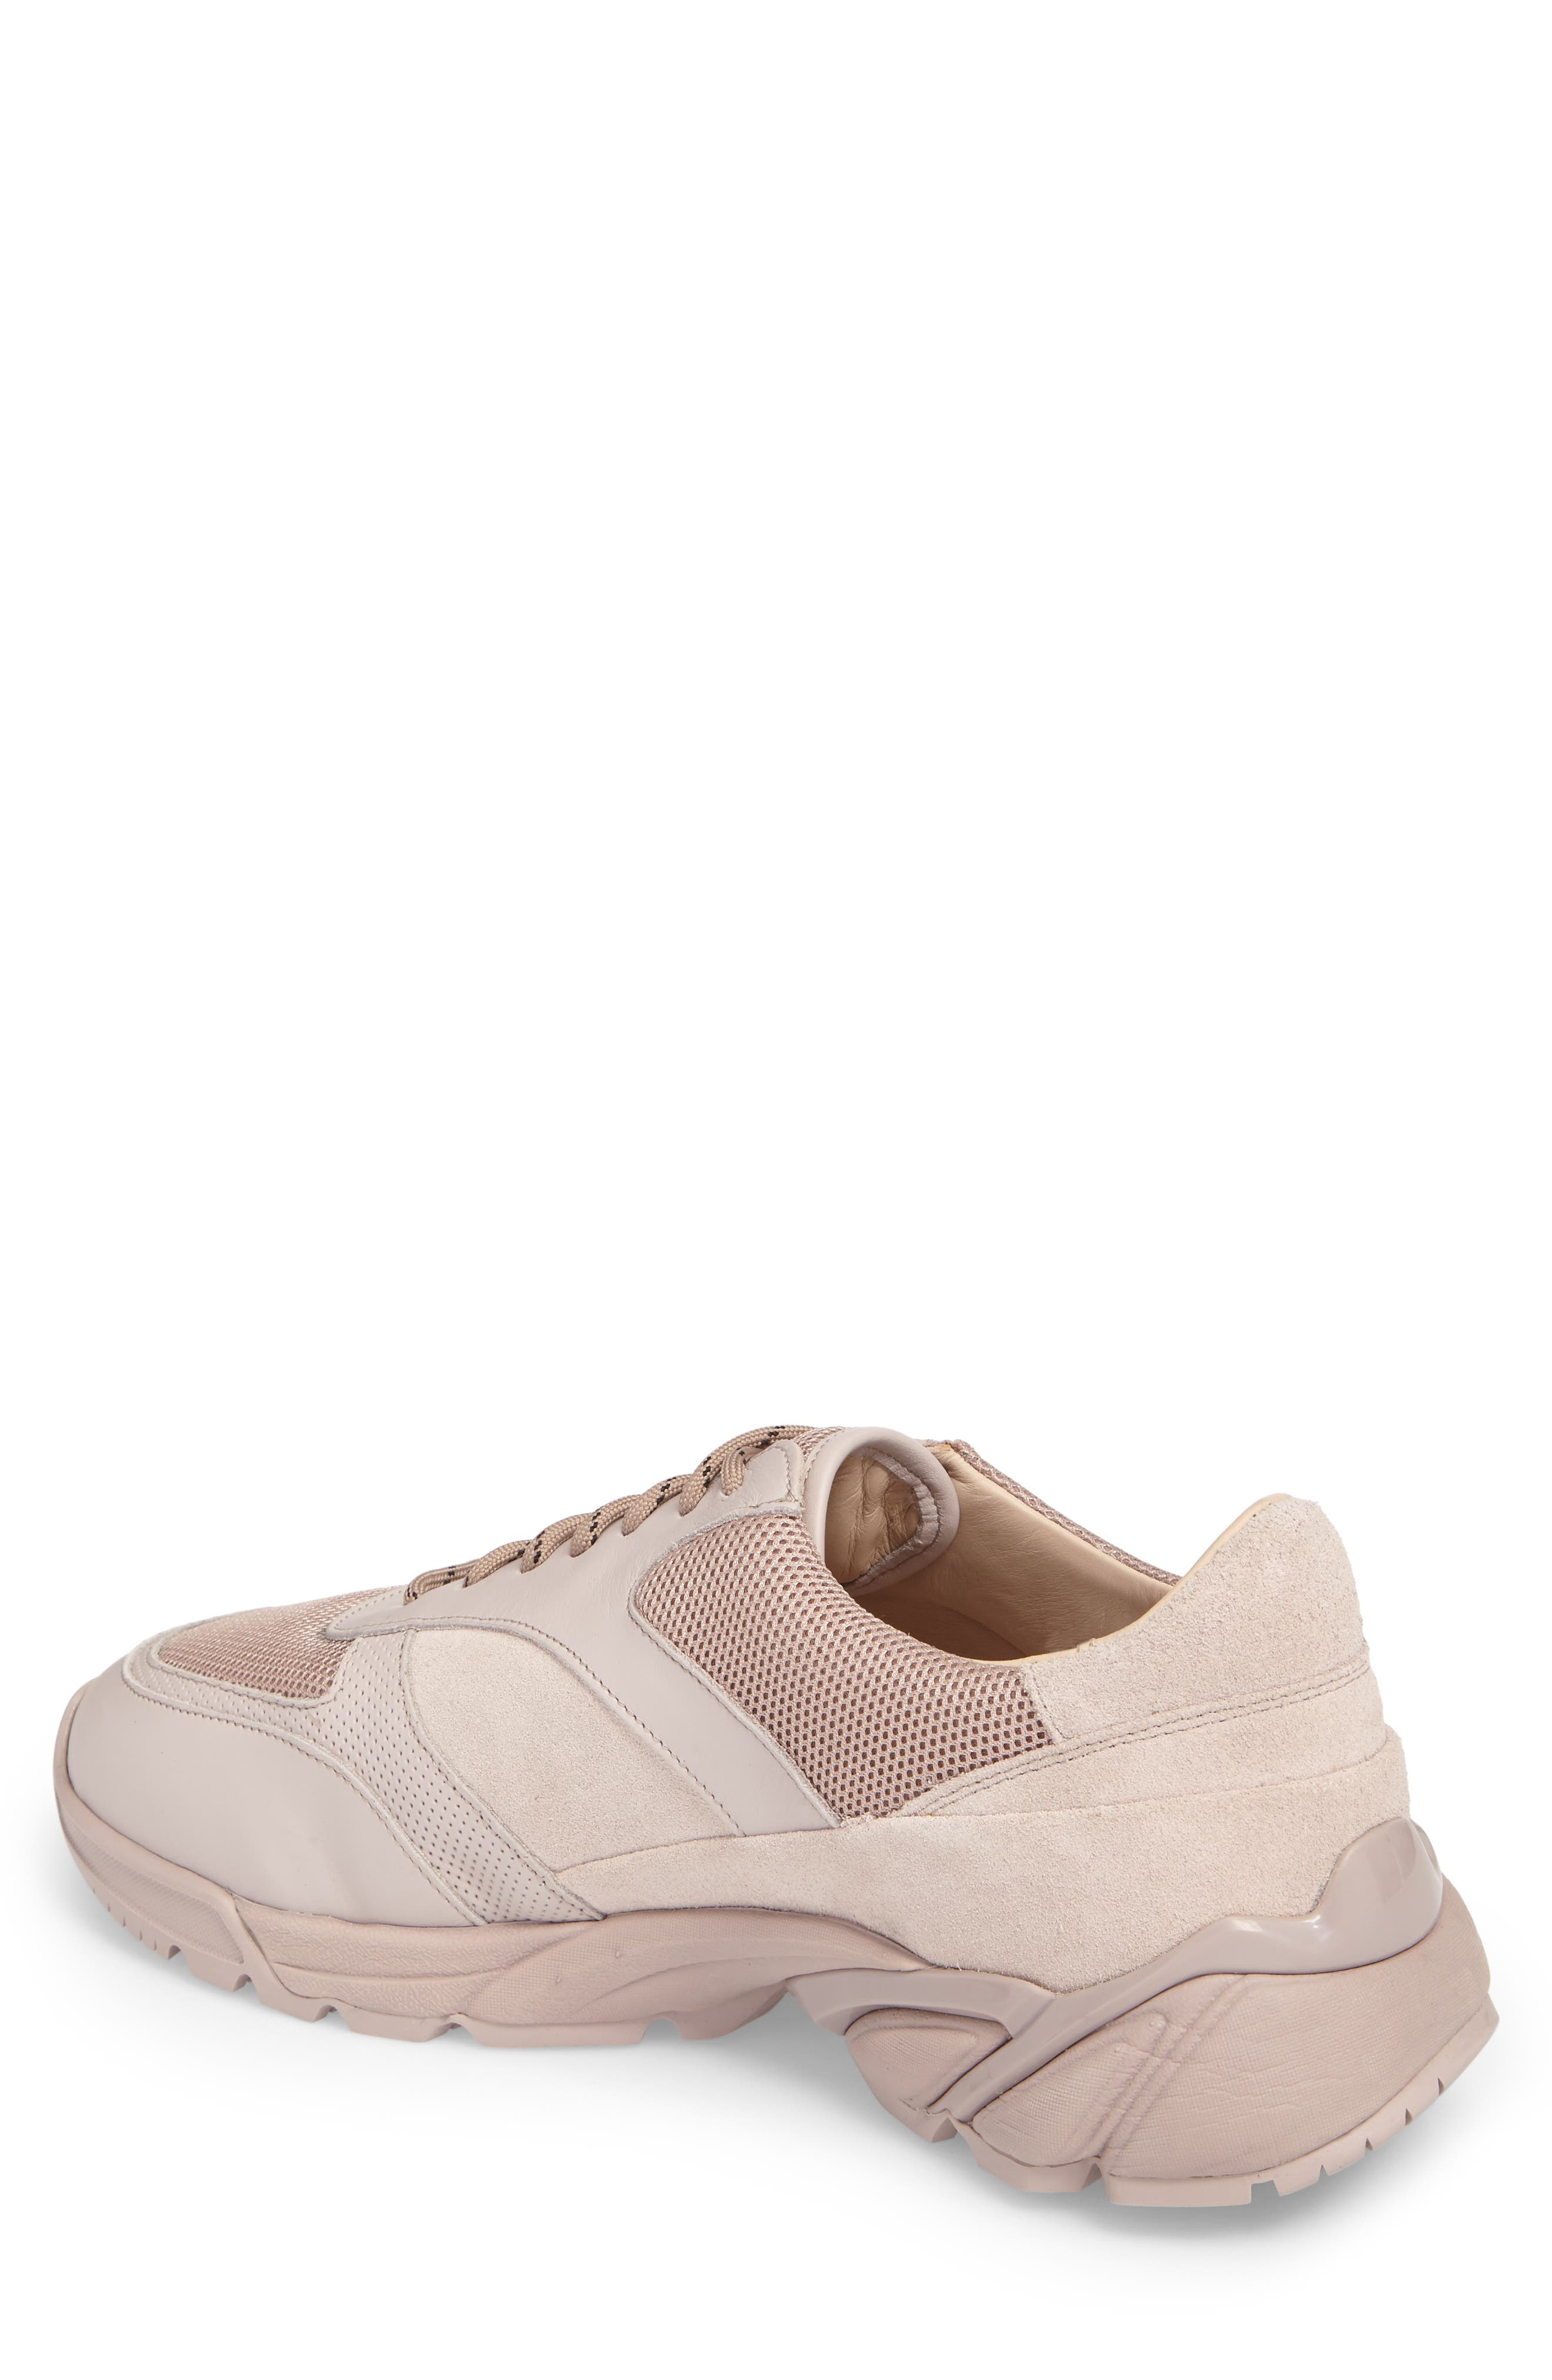 Tech Sneaker,                             Alternate thumbnail 2, color,                             650